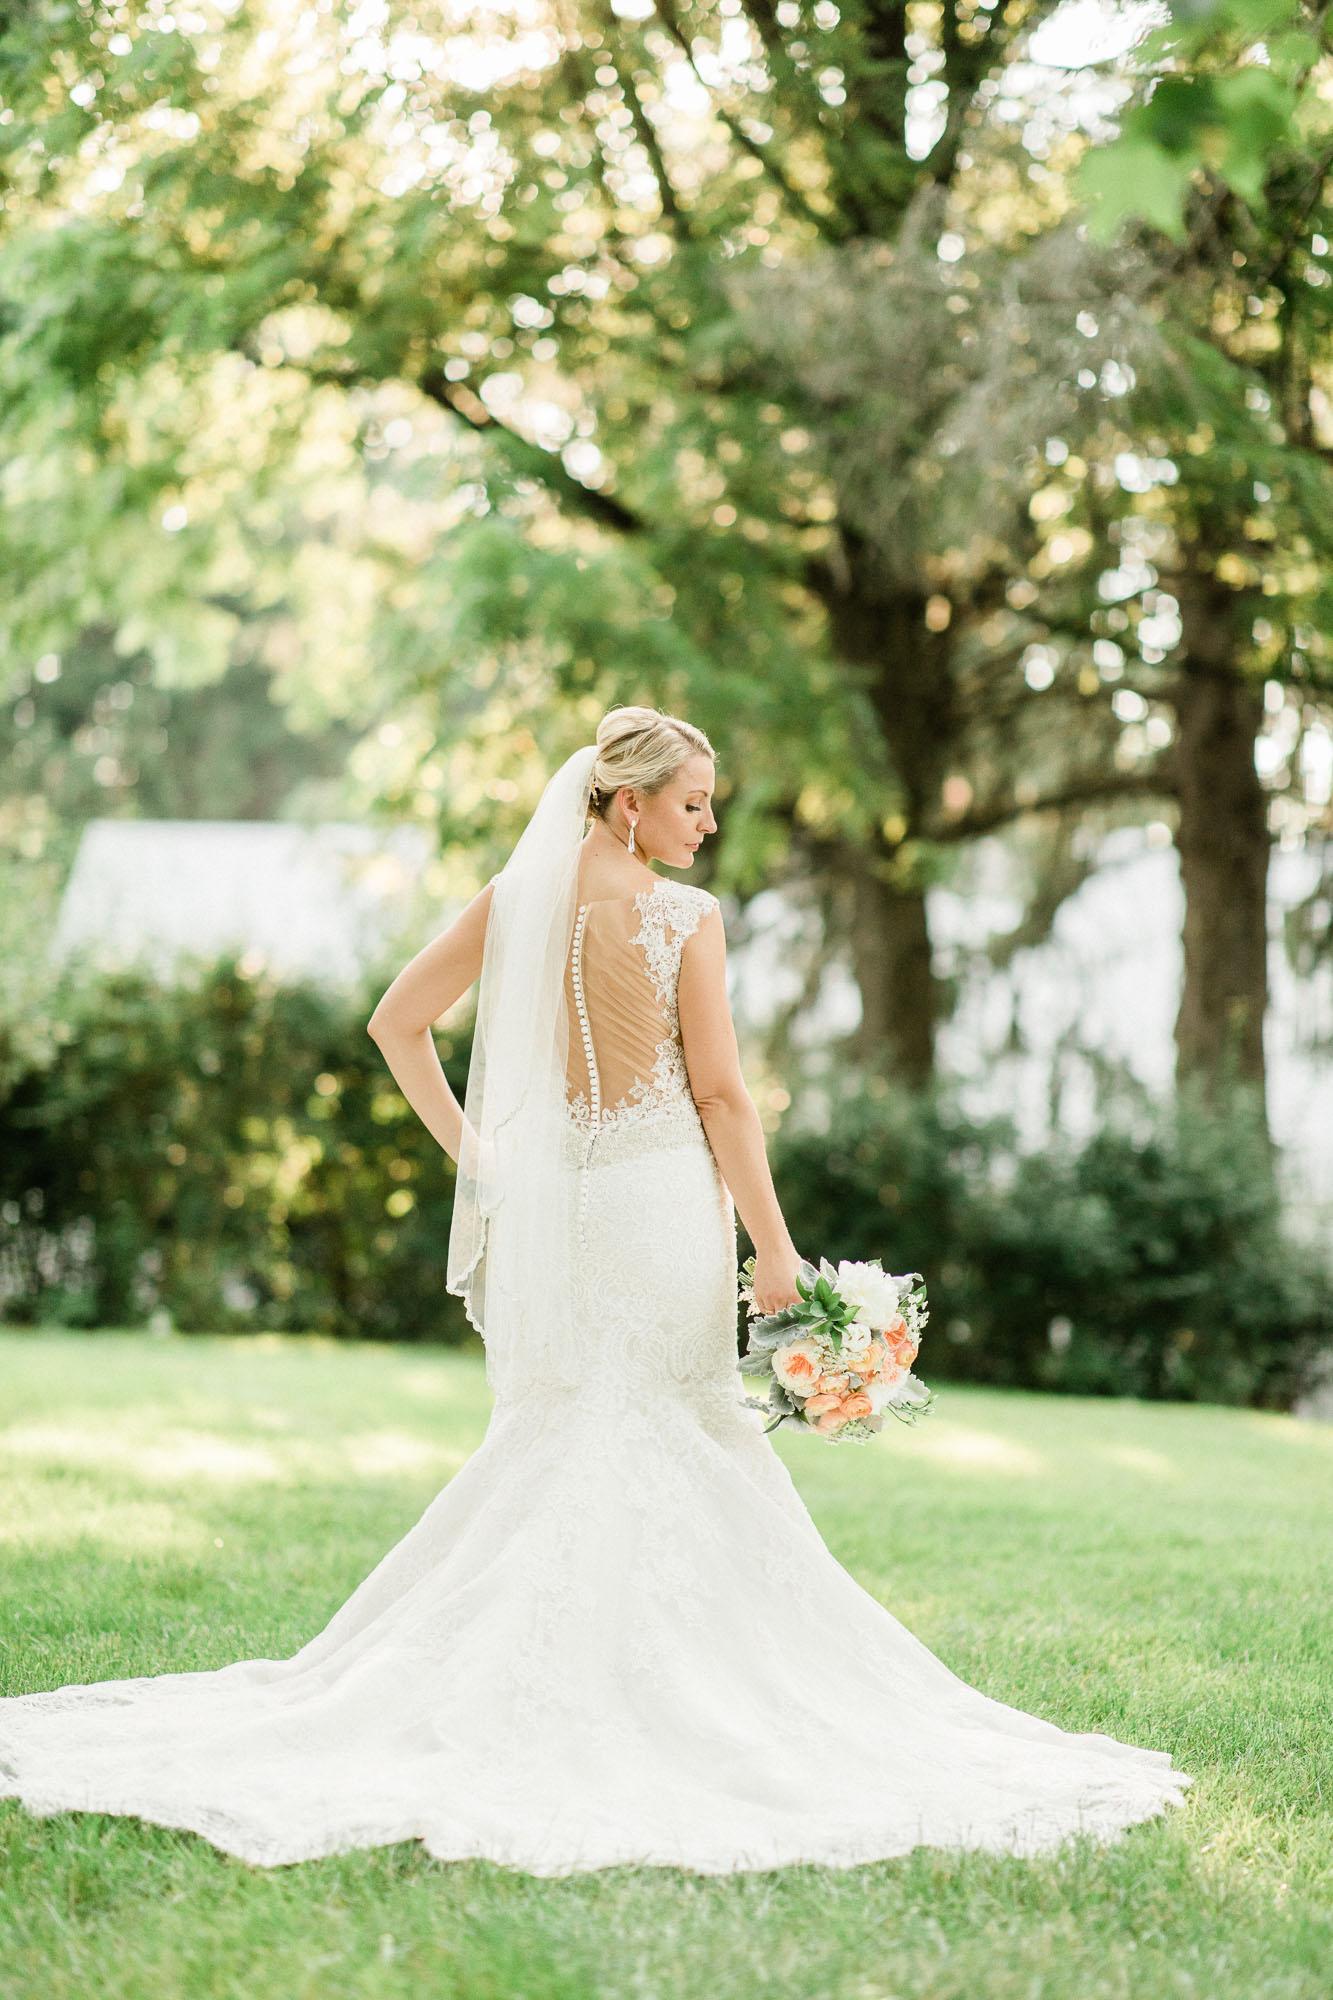 Allenberry-resort-historic-pennsylvania-wedding-22354.jpg